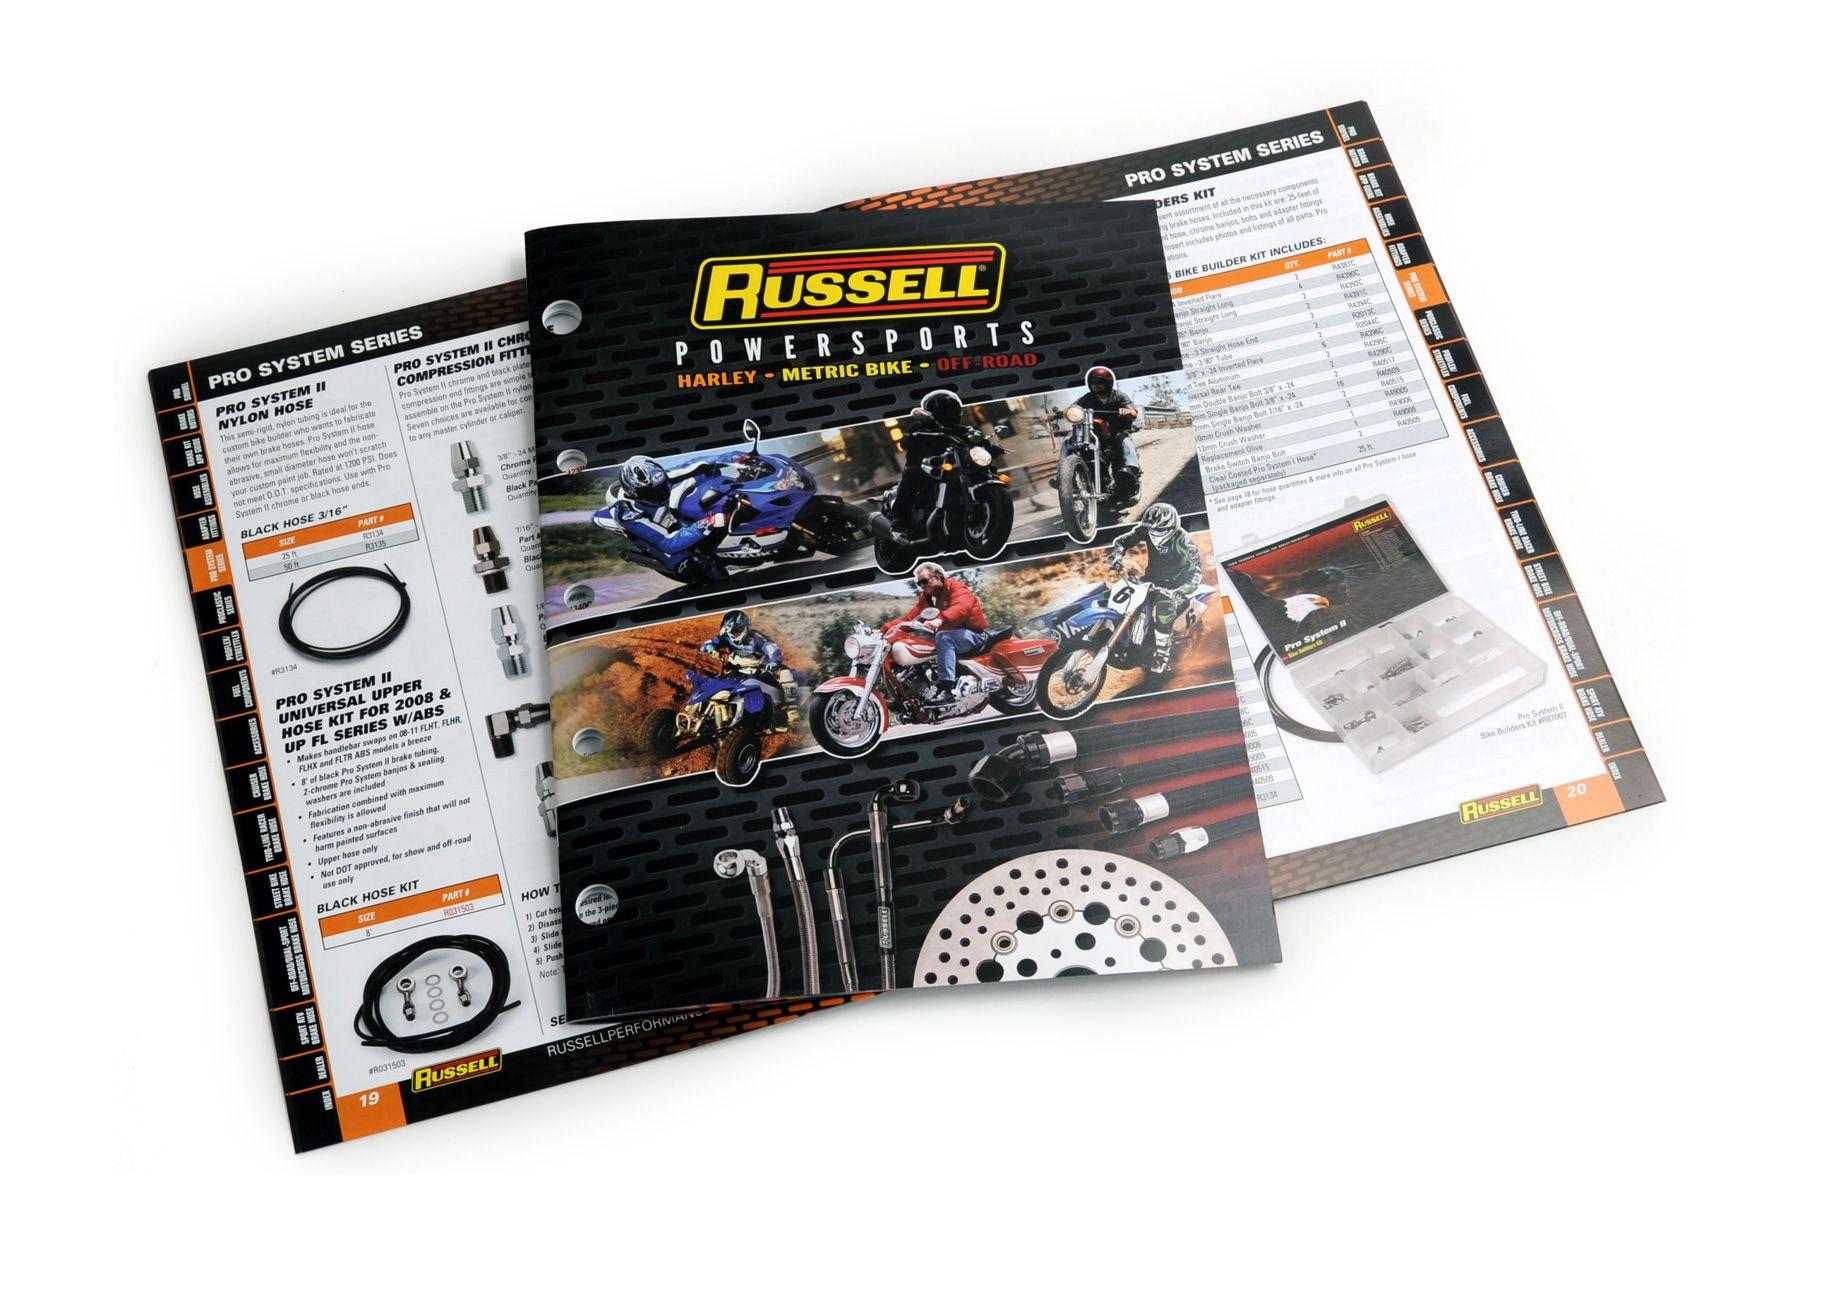 Russell Powersports  http://www.edelbrock.com/media/news/2012/russell/img/ps_cat.jpg